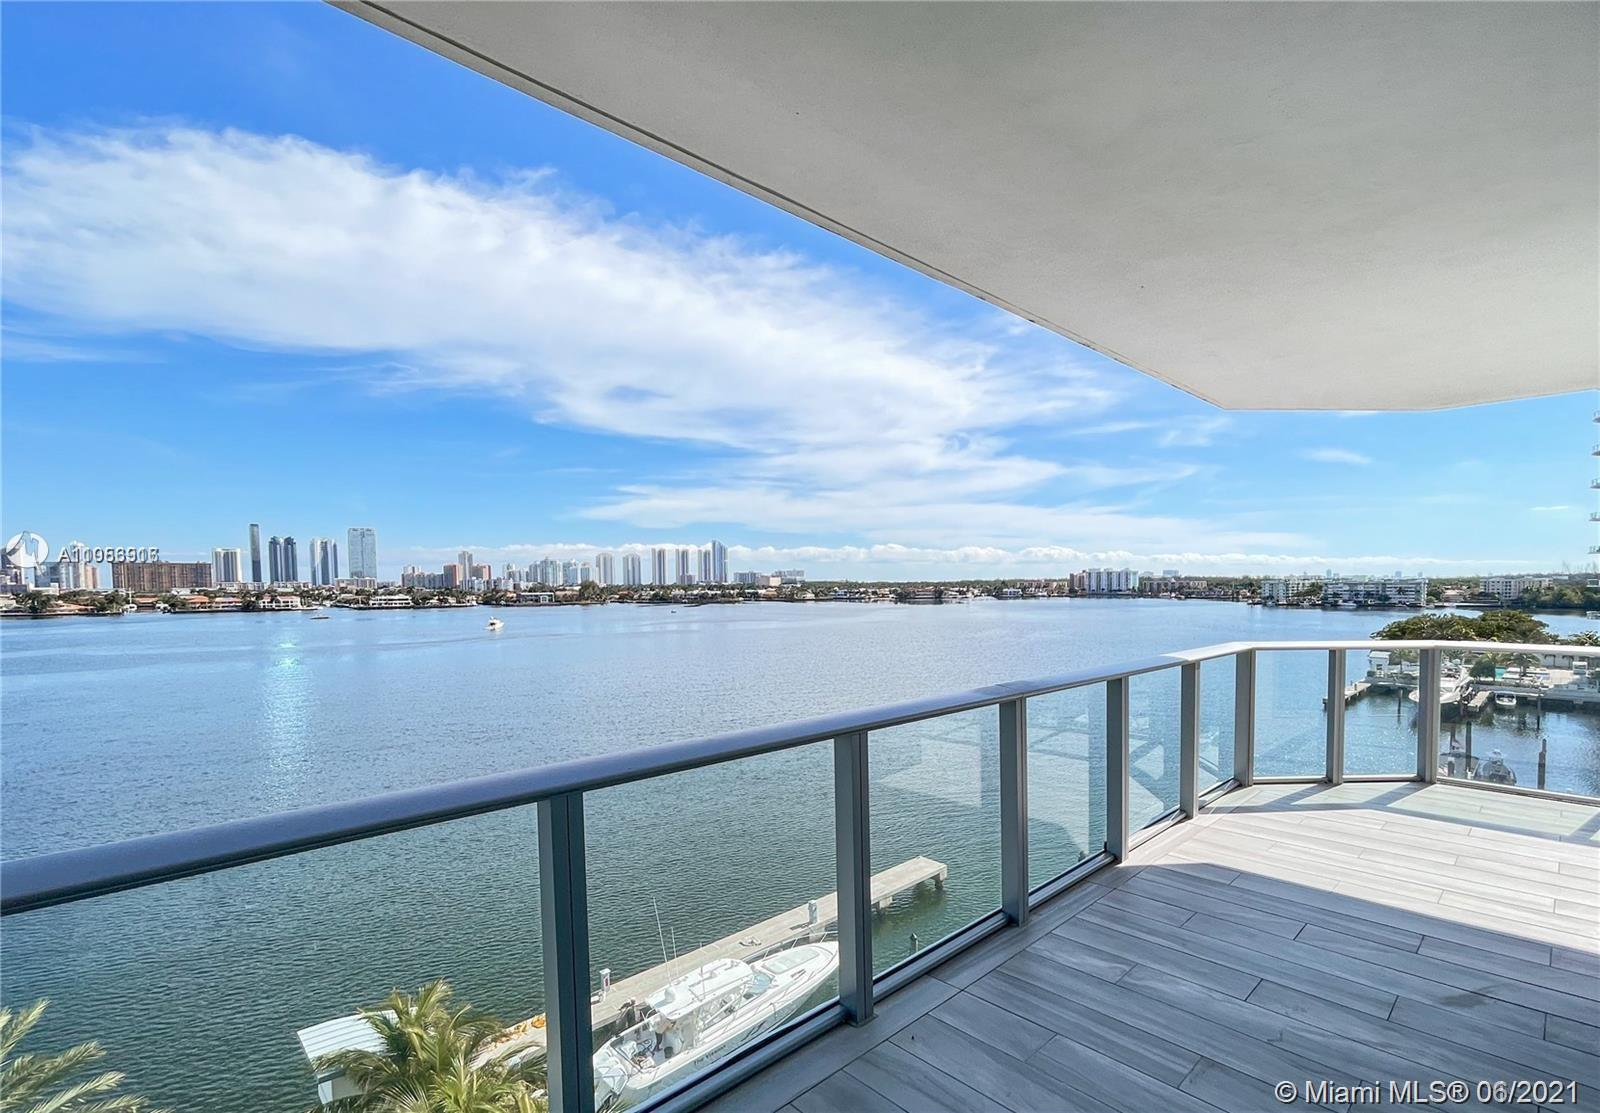 Marina Palms 2 #609 - 17301 Biscayne Blvd #609, North Miami Beach, FL 33160